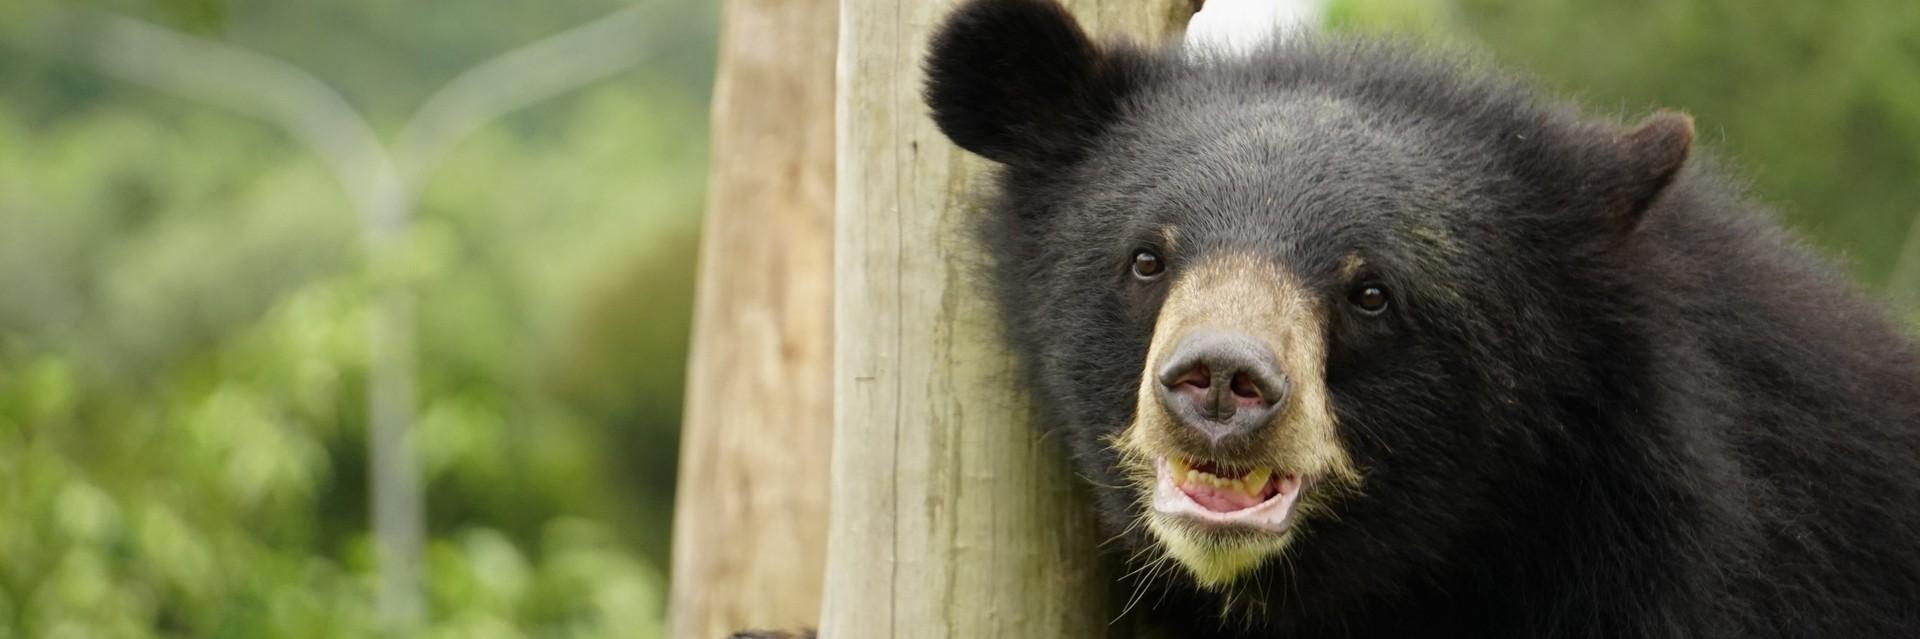 Bear Lac in the outdoor enclosure at BEAR SANCTUARY Ninh Binh